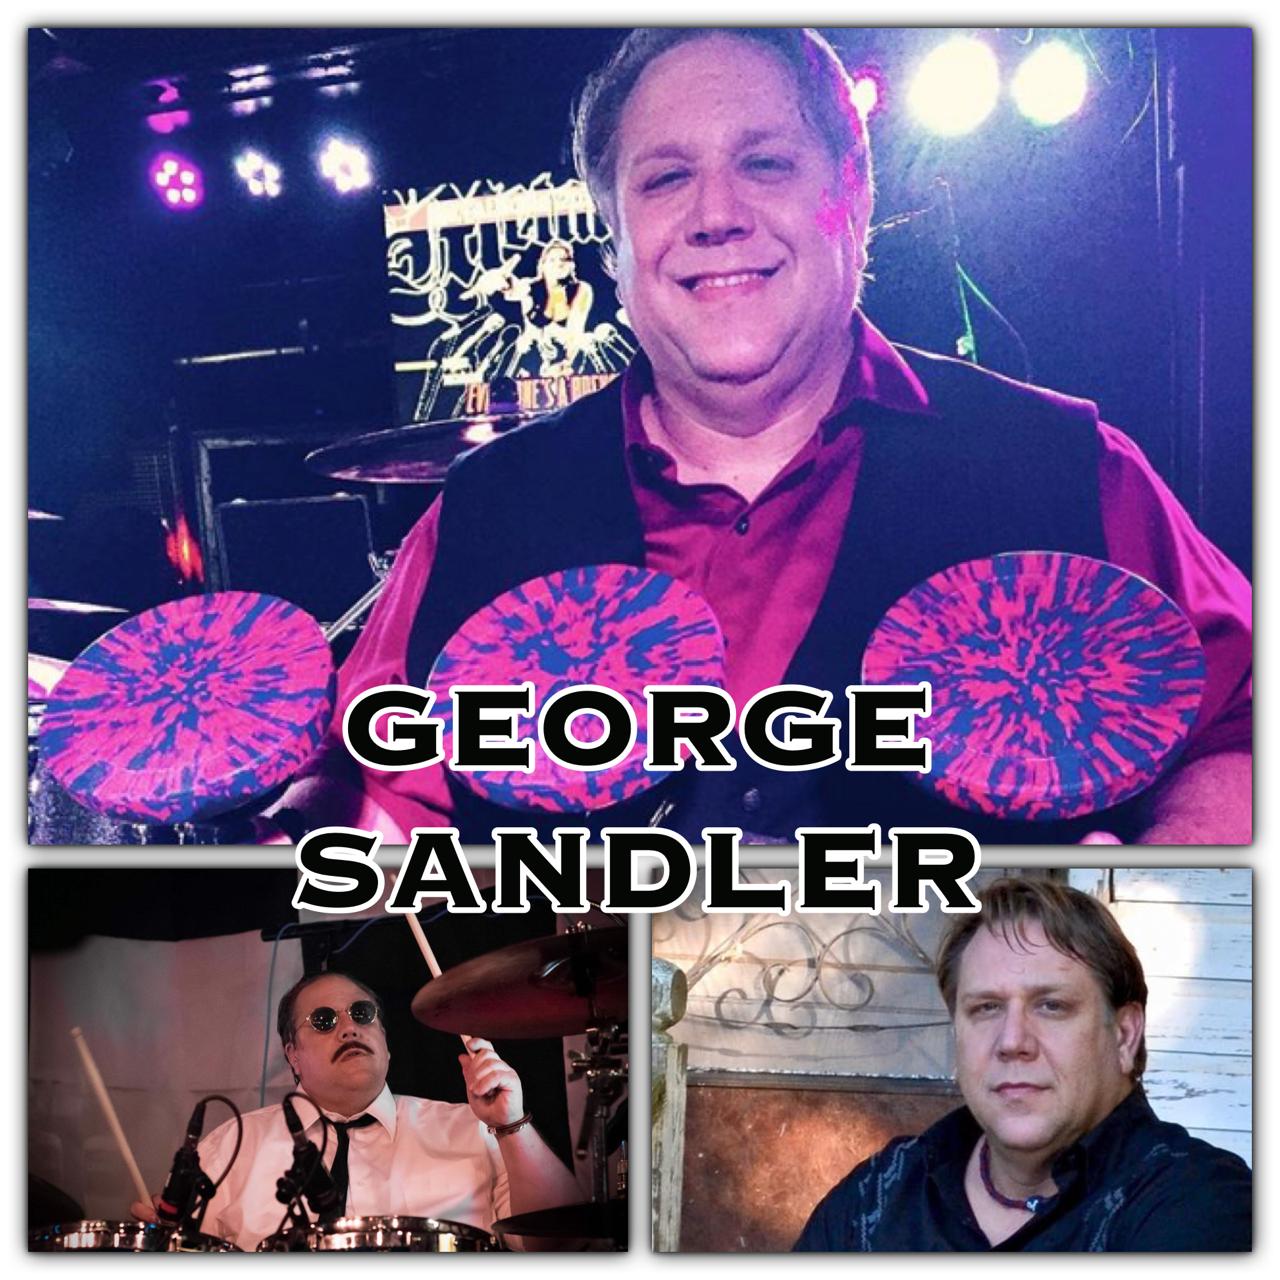 GEORGE SANDLER